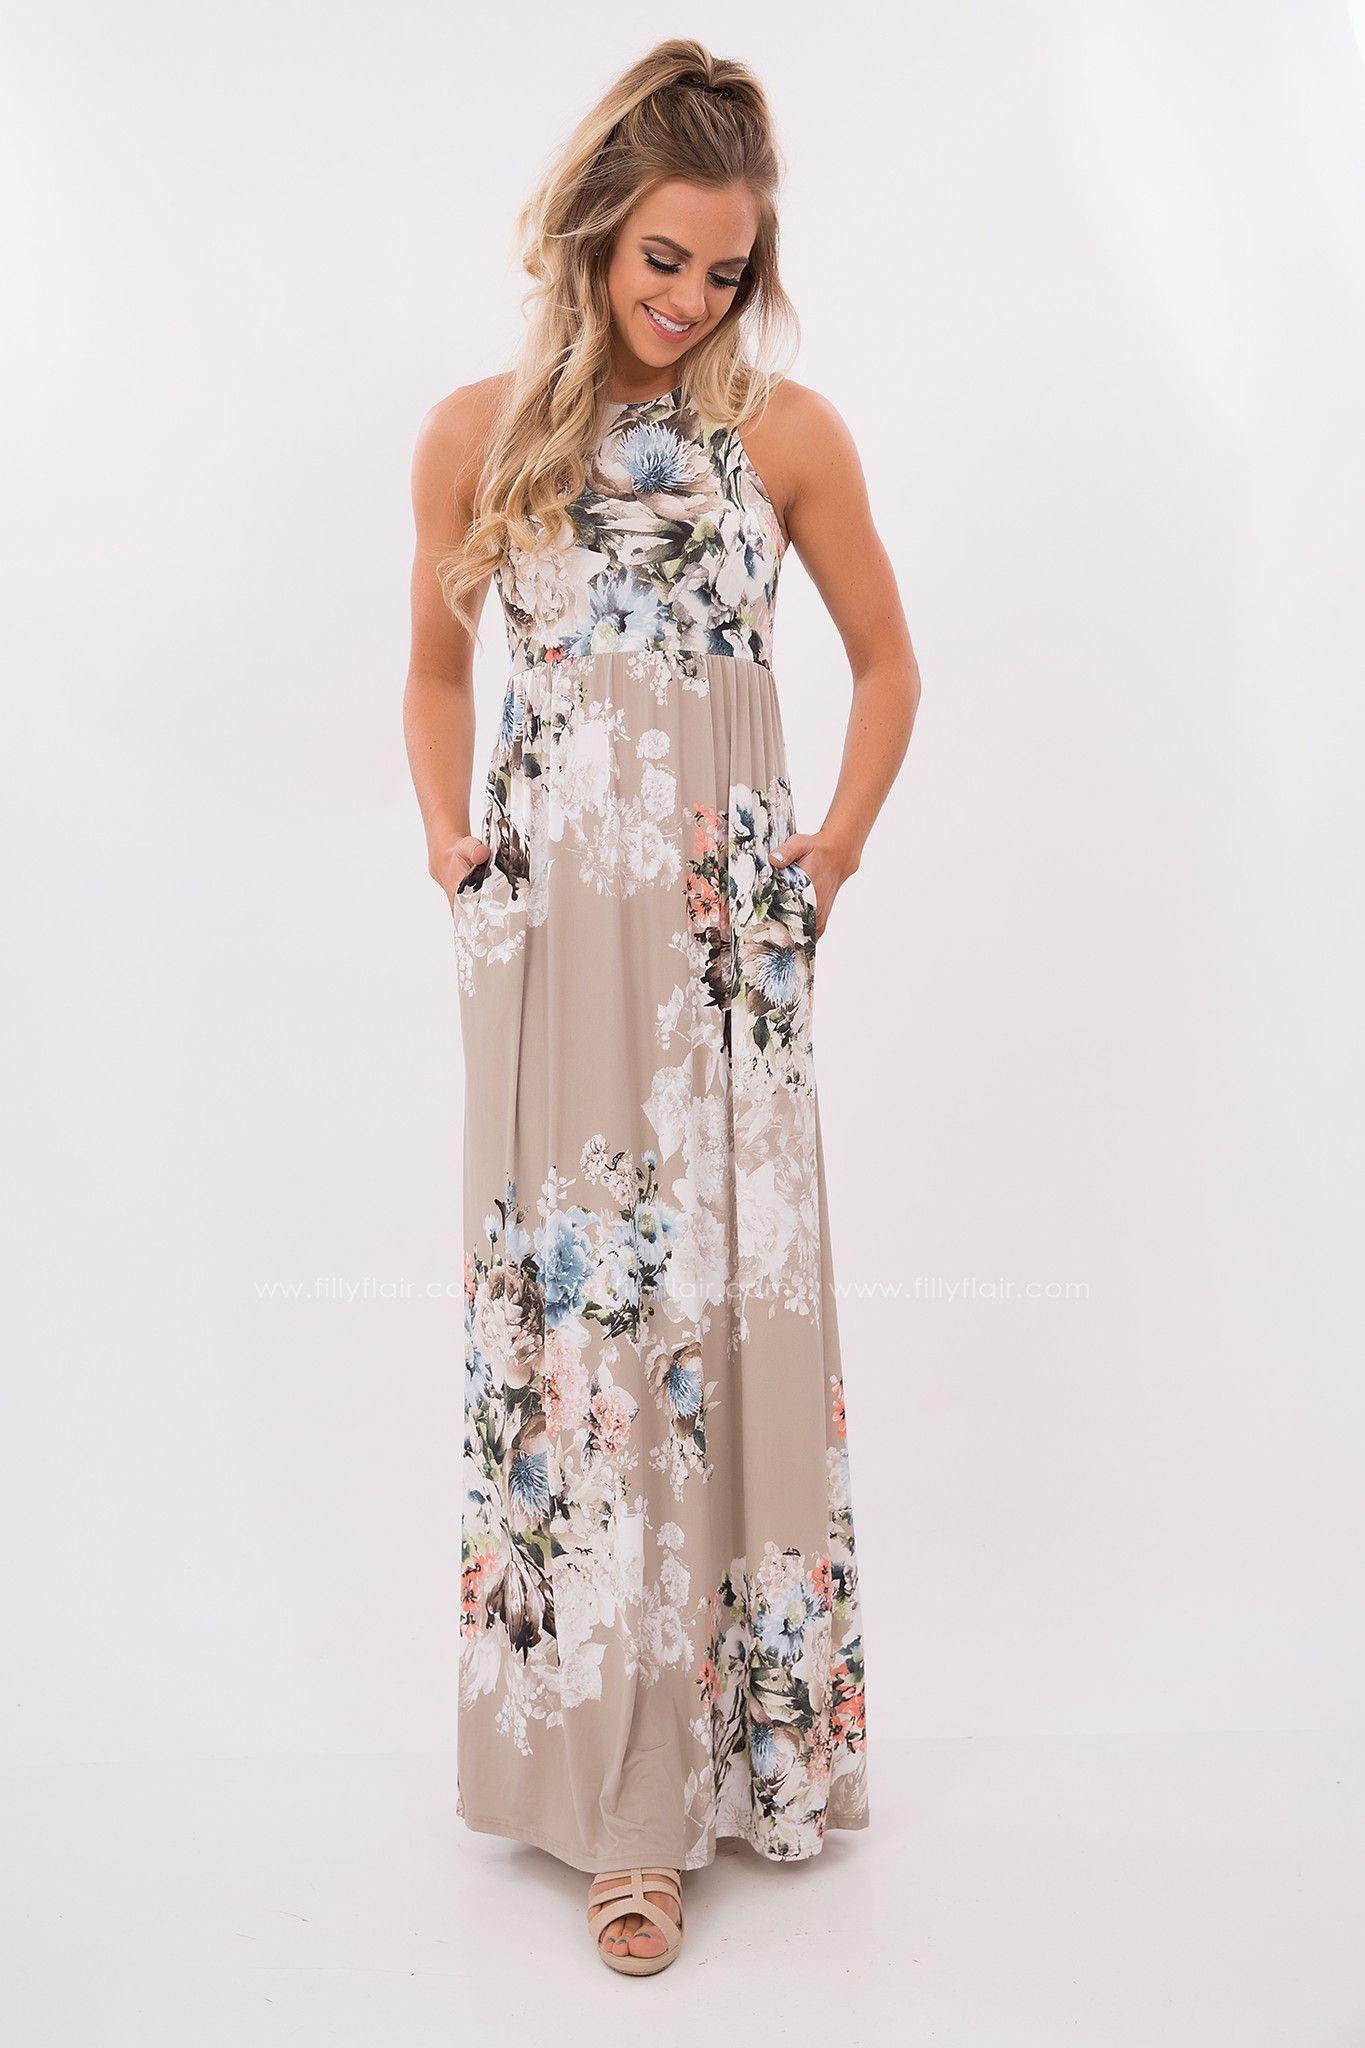 Floral Maxi Dress Maxi Dress Boho Dress Printed Summer Dresses